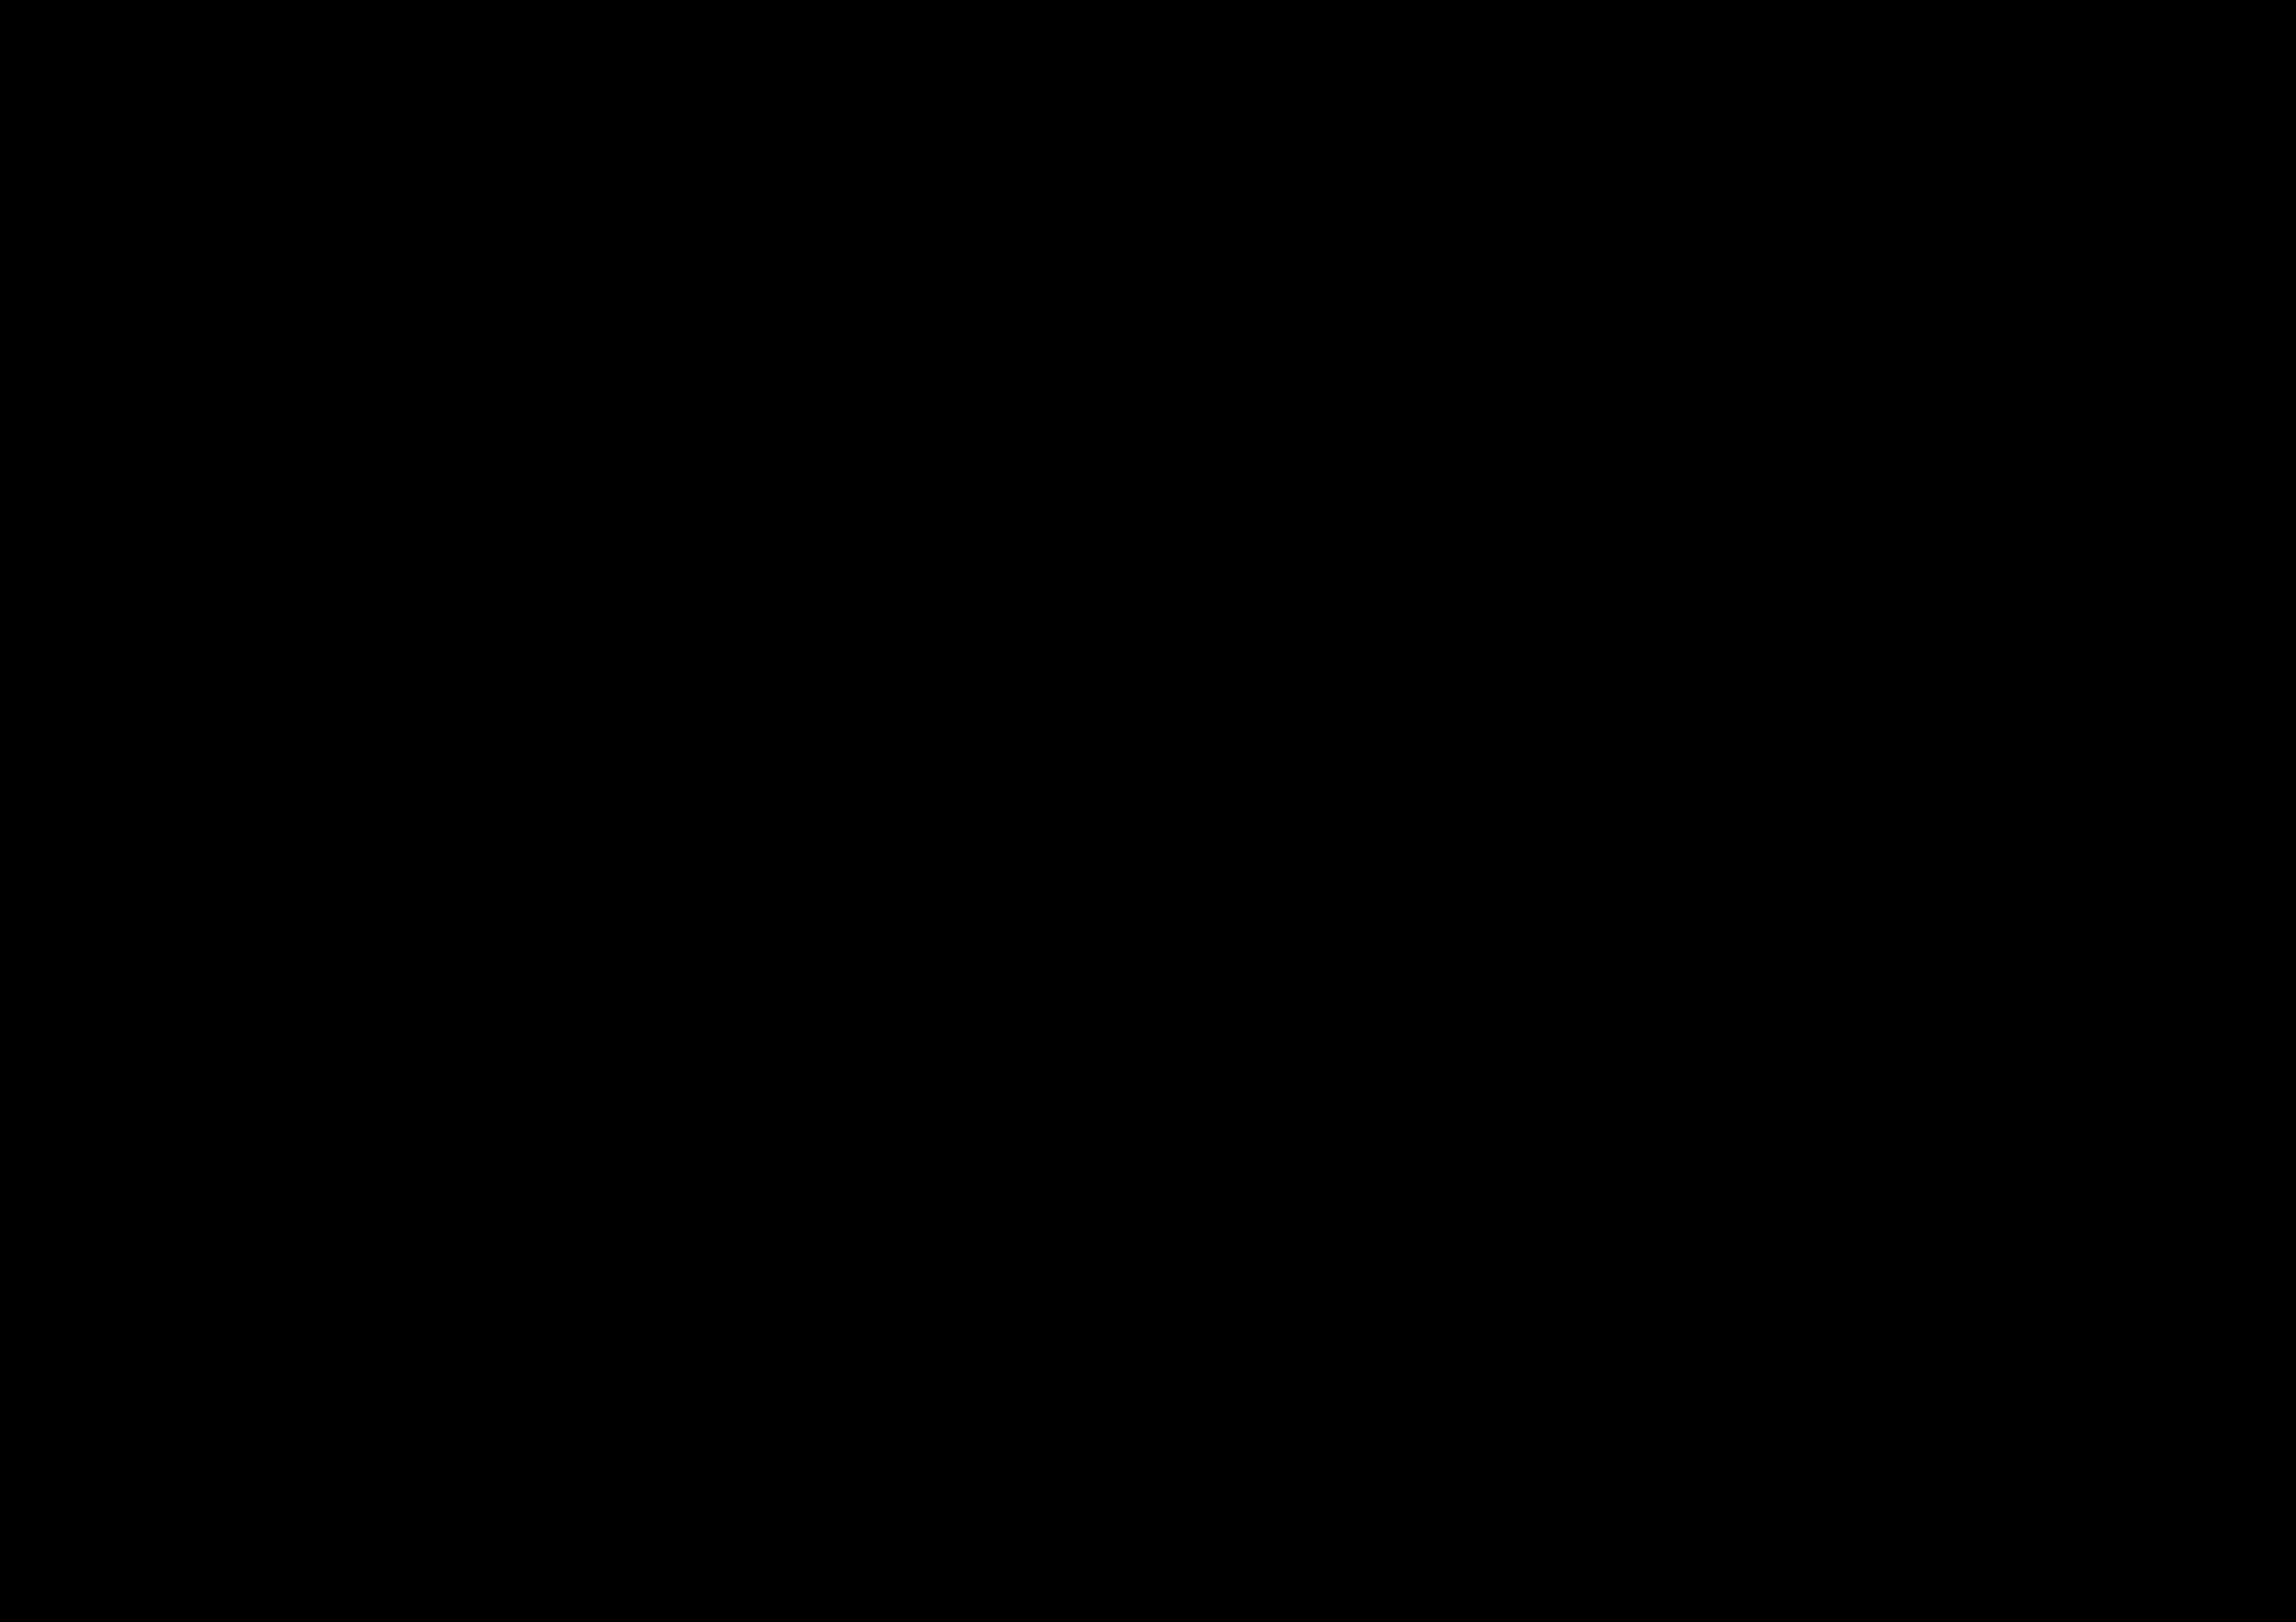 cartoon-crack-banner-1.png